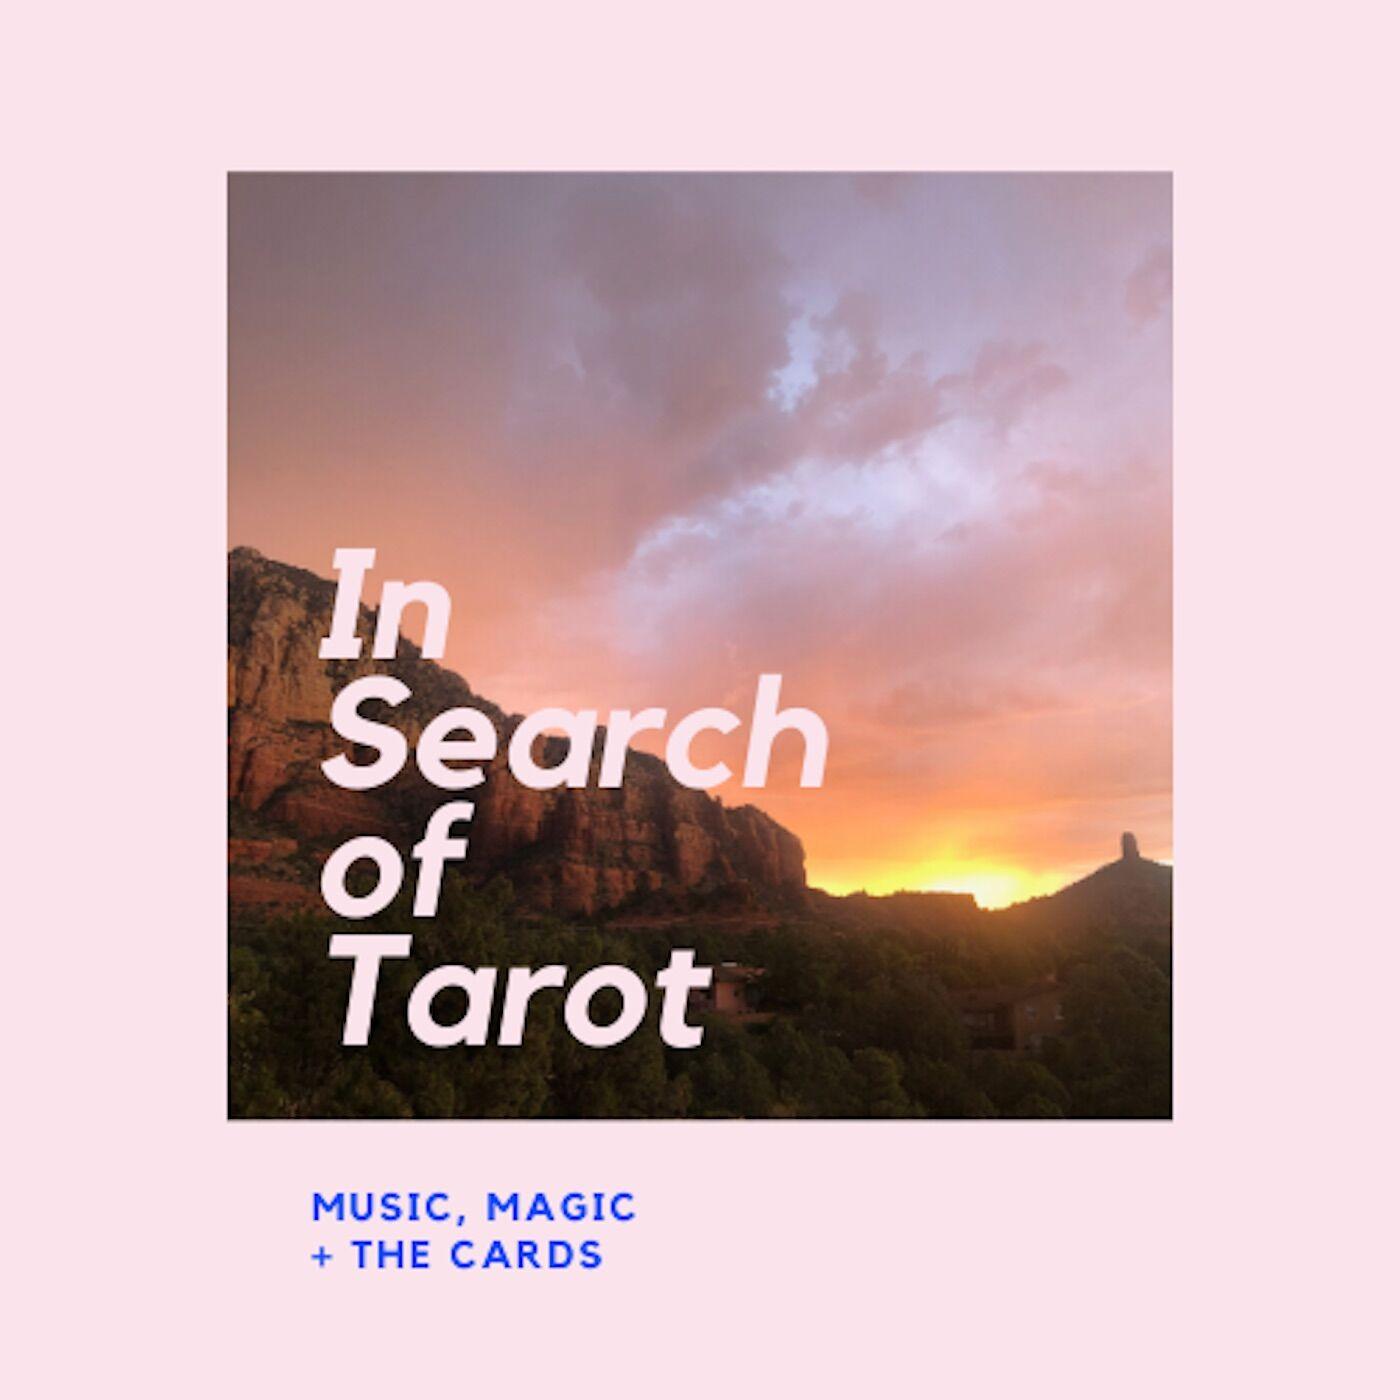 In Search of Tarot